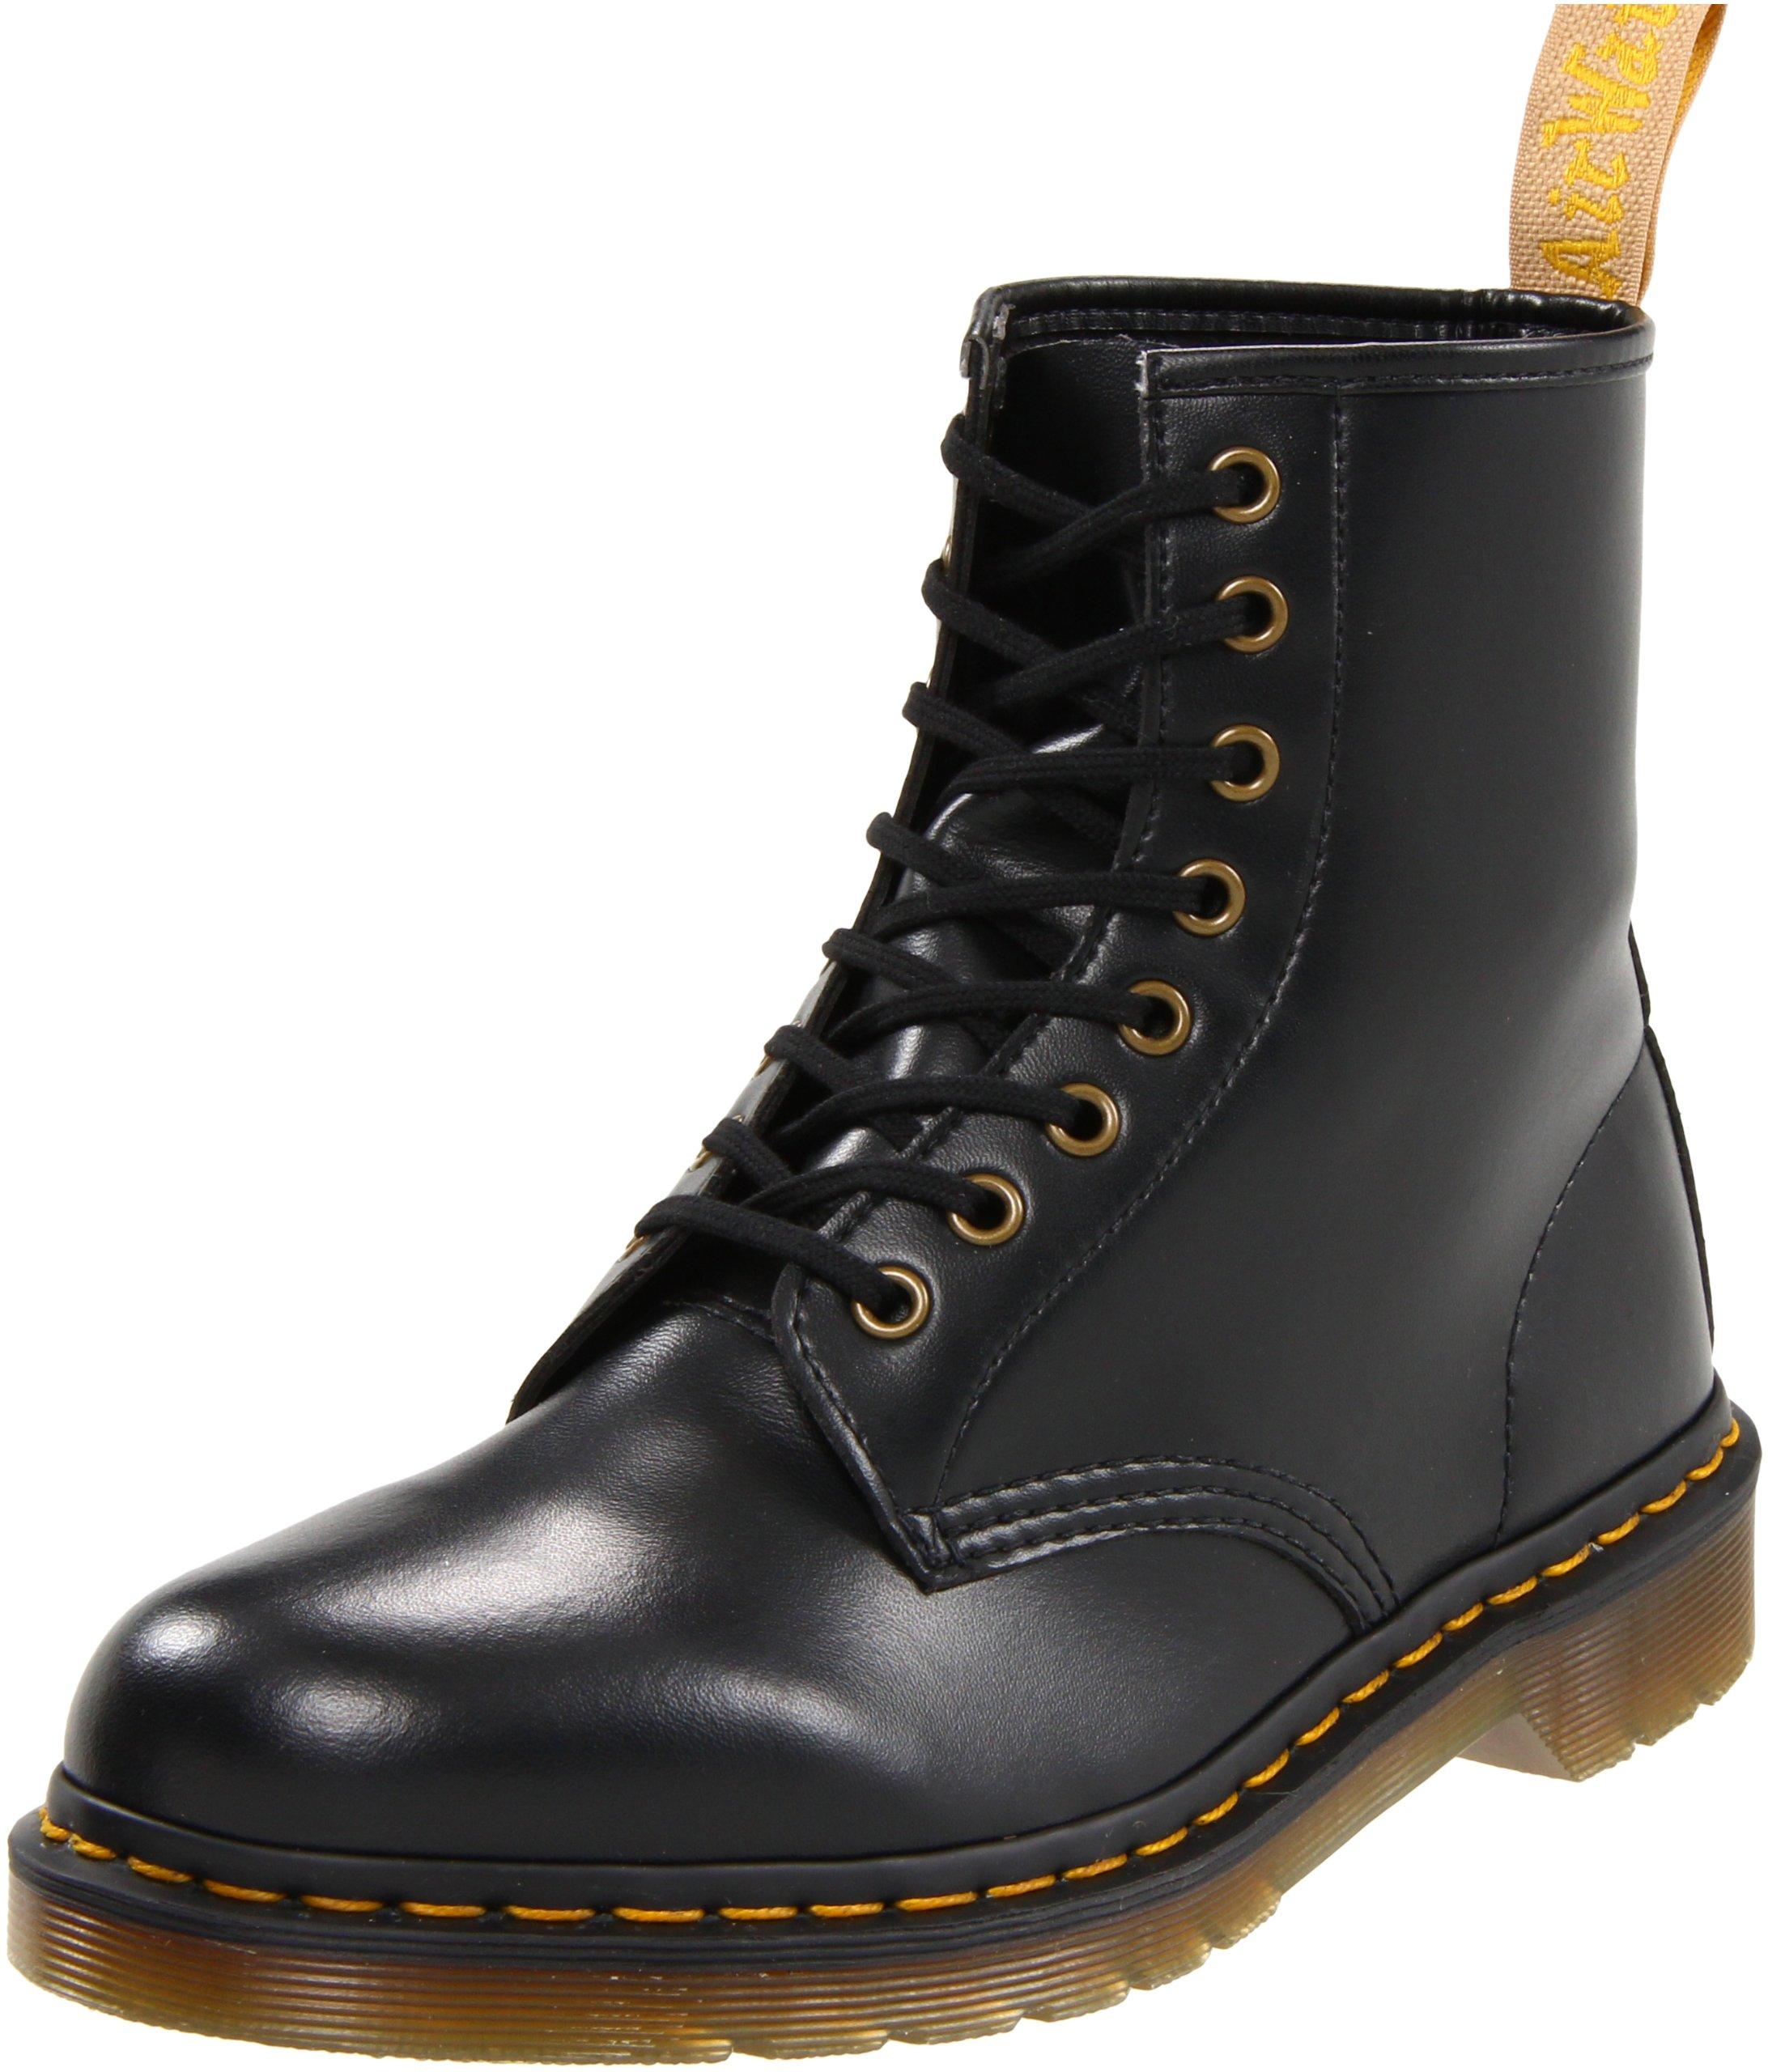 Dr. Martens Vegan 1460 Smooth Black Combat Boot,  Fleix Rub, 10 B(M) US Women / 9 D(M) US Men by Dr. Martens